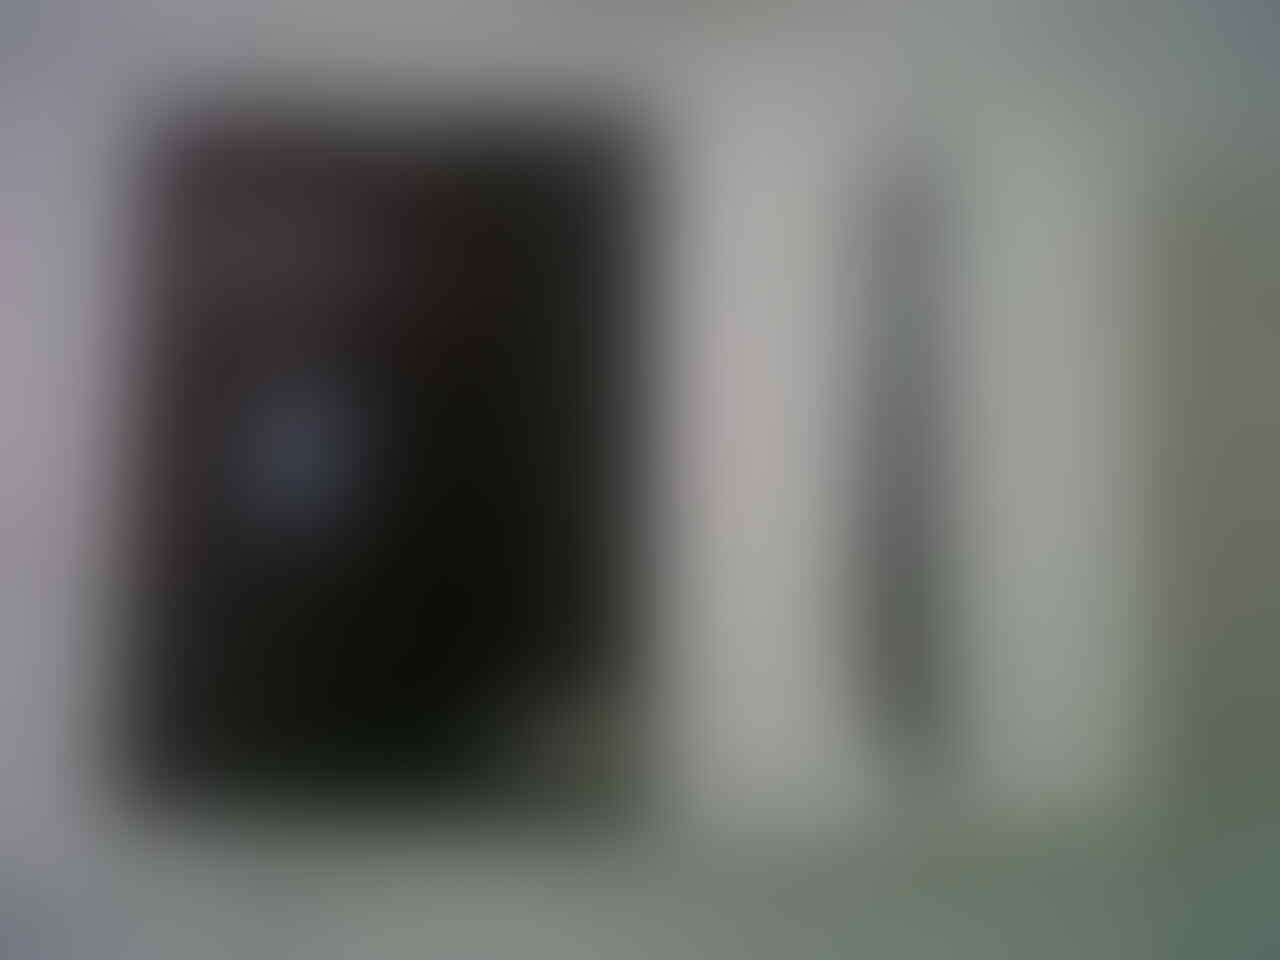 OBRAL IPAD MINI 16GB CELLULAR+WIFI BLACK MALANG SURABAYA